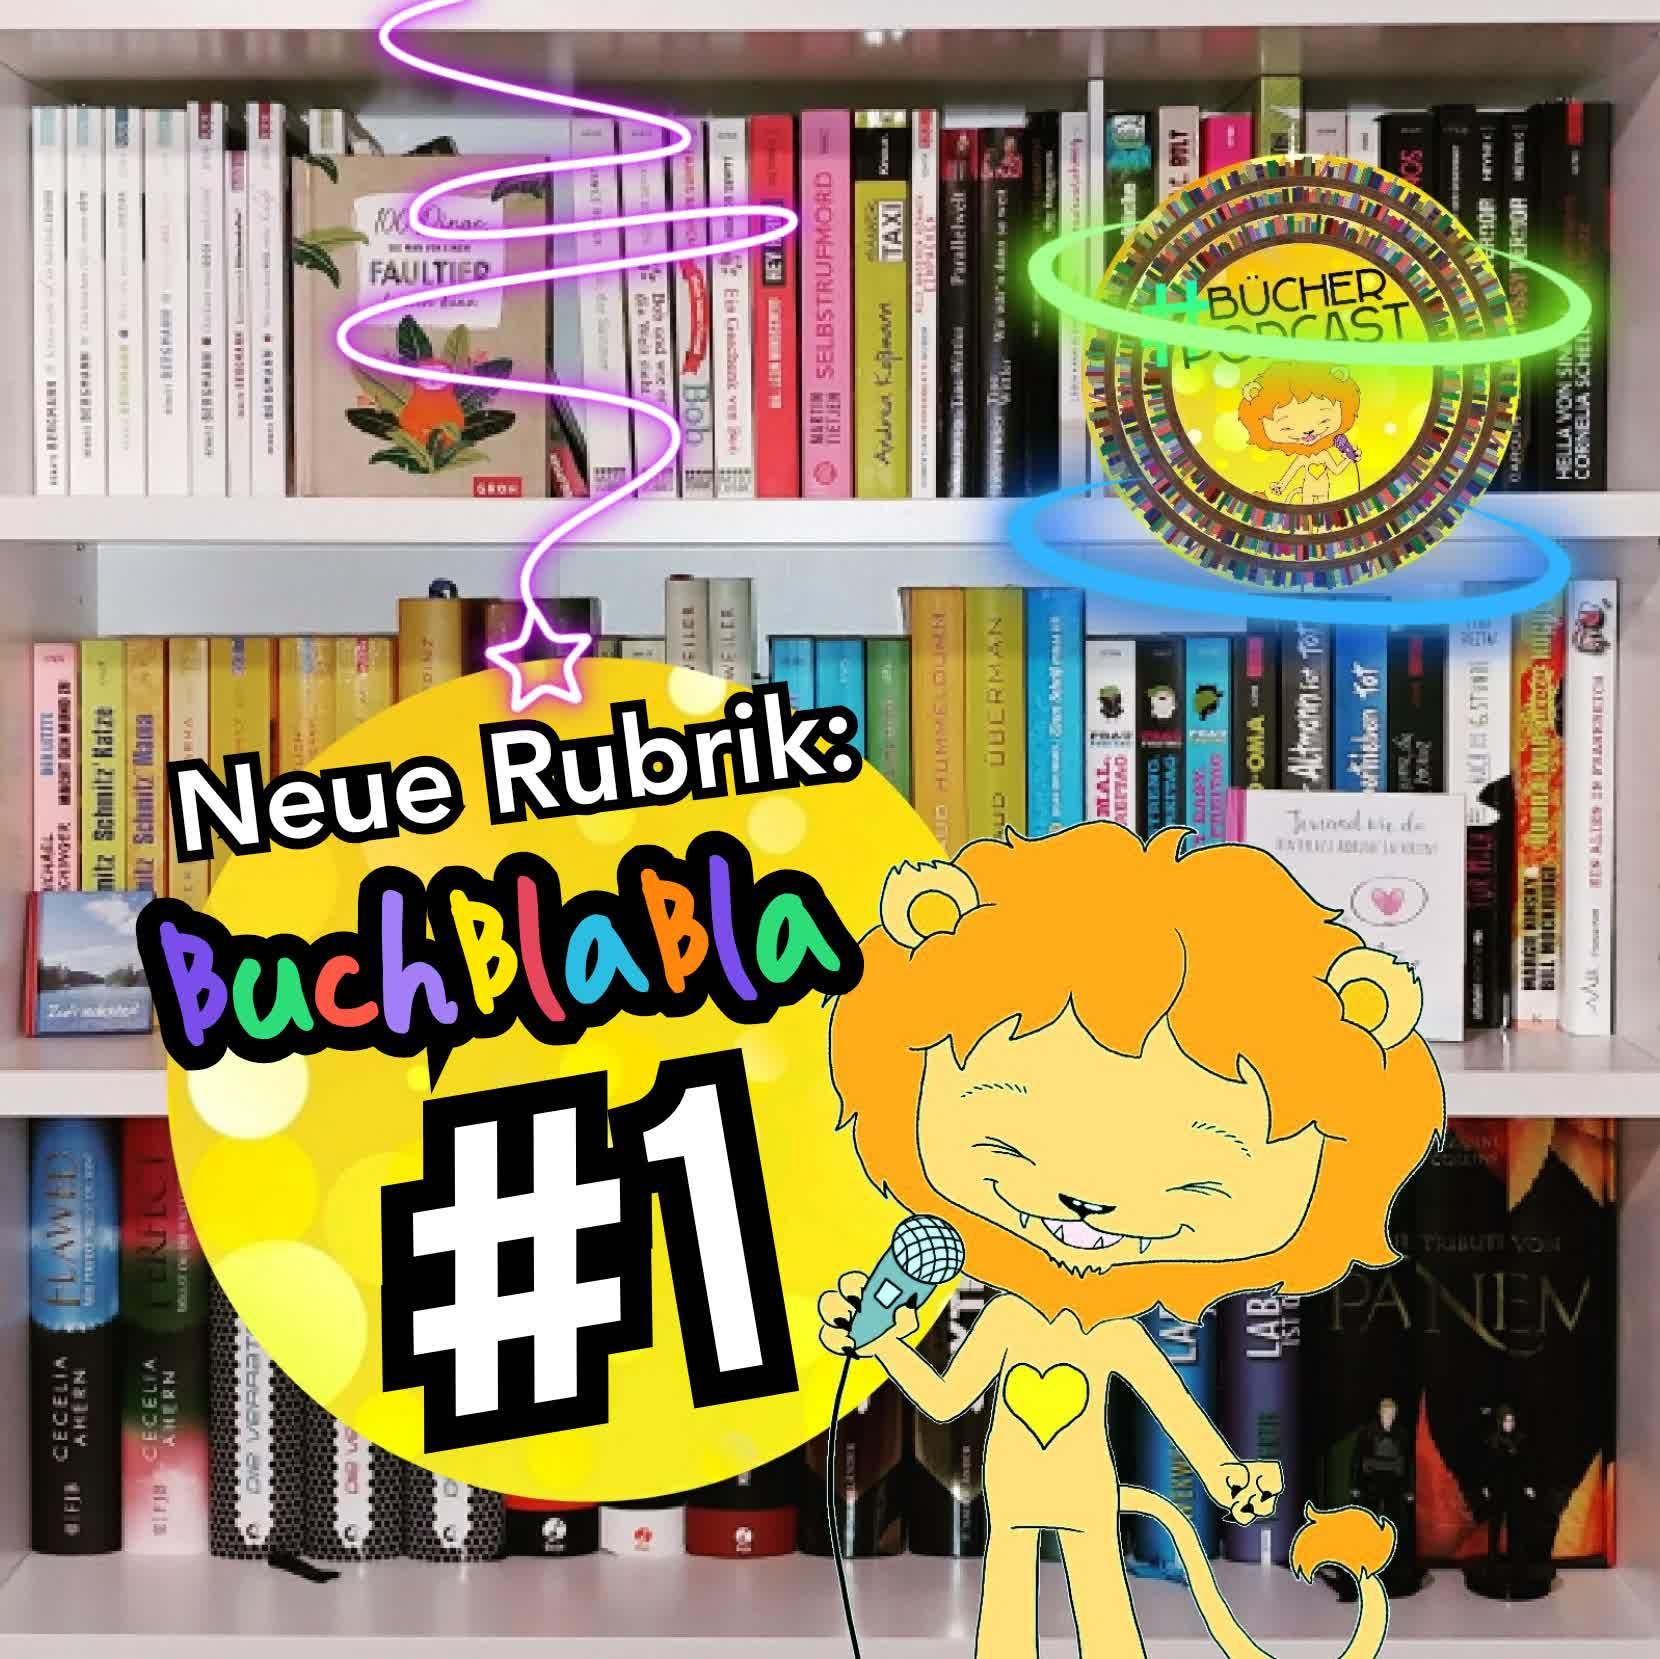 BuchBlaBla #1